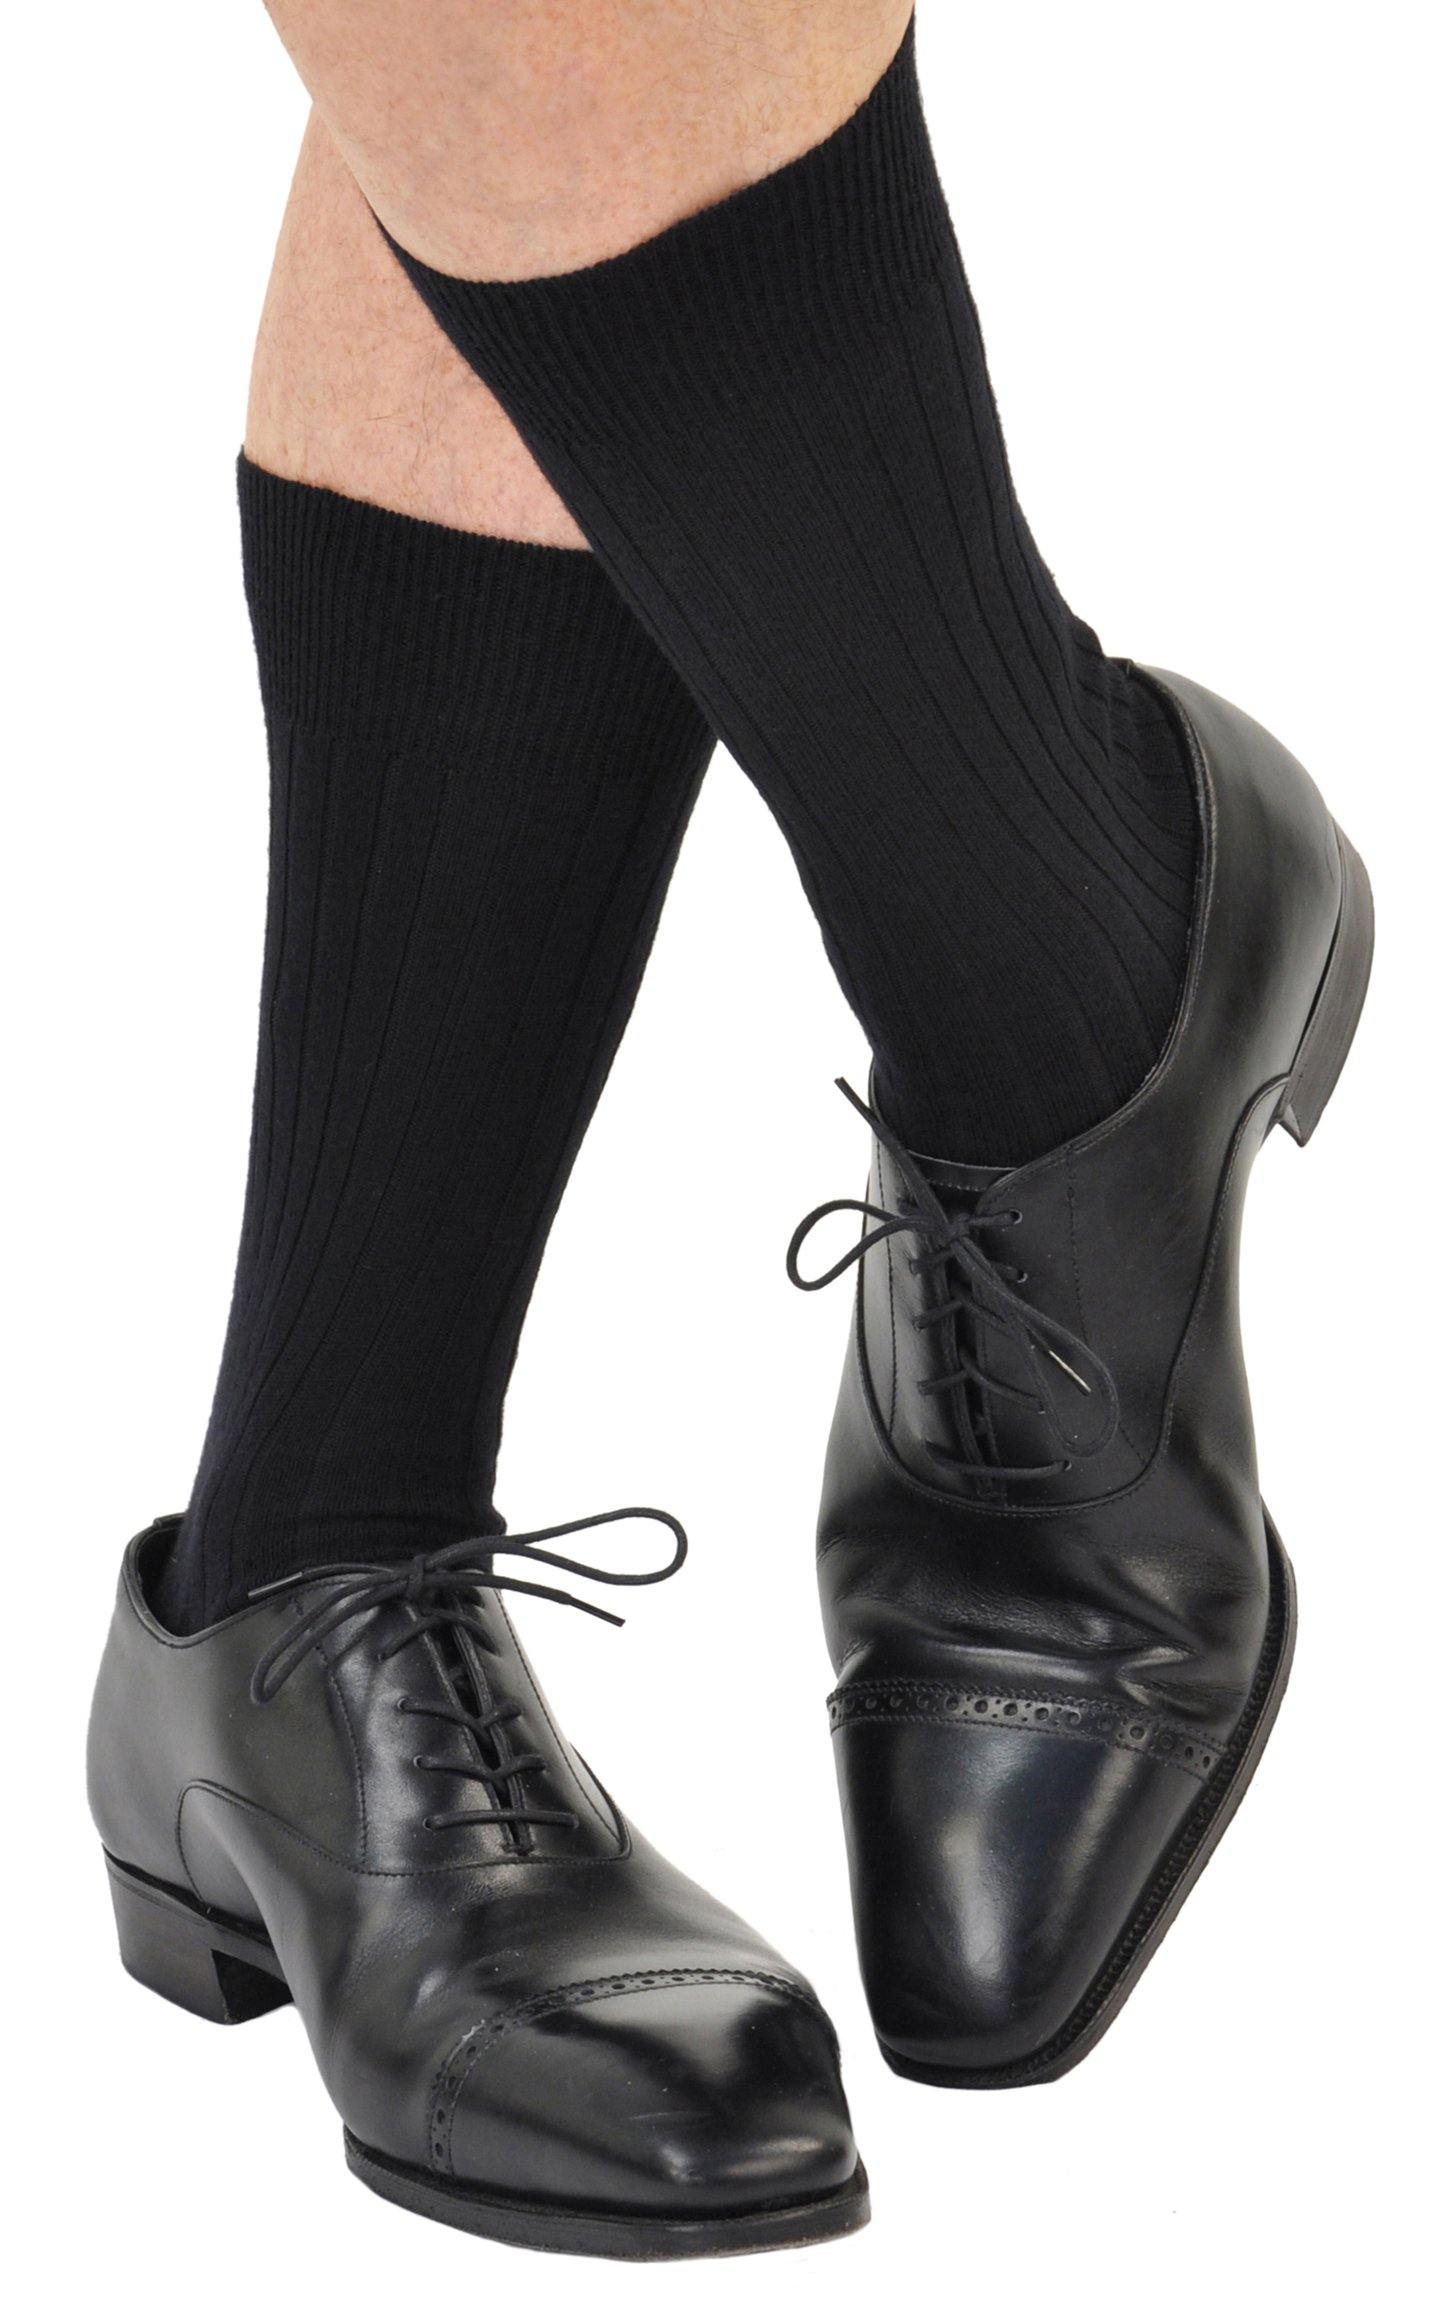 6 Pairs Men's ExtraFine Merino Marcoliani Mid-Calf Italian Dress Socks: 6 Black by Marcoliani Milano (Image #2)